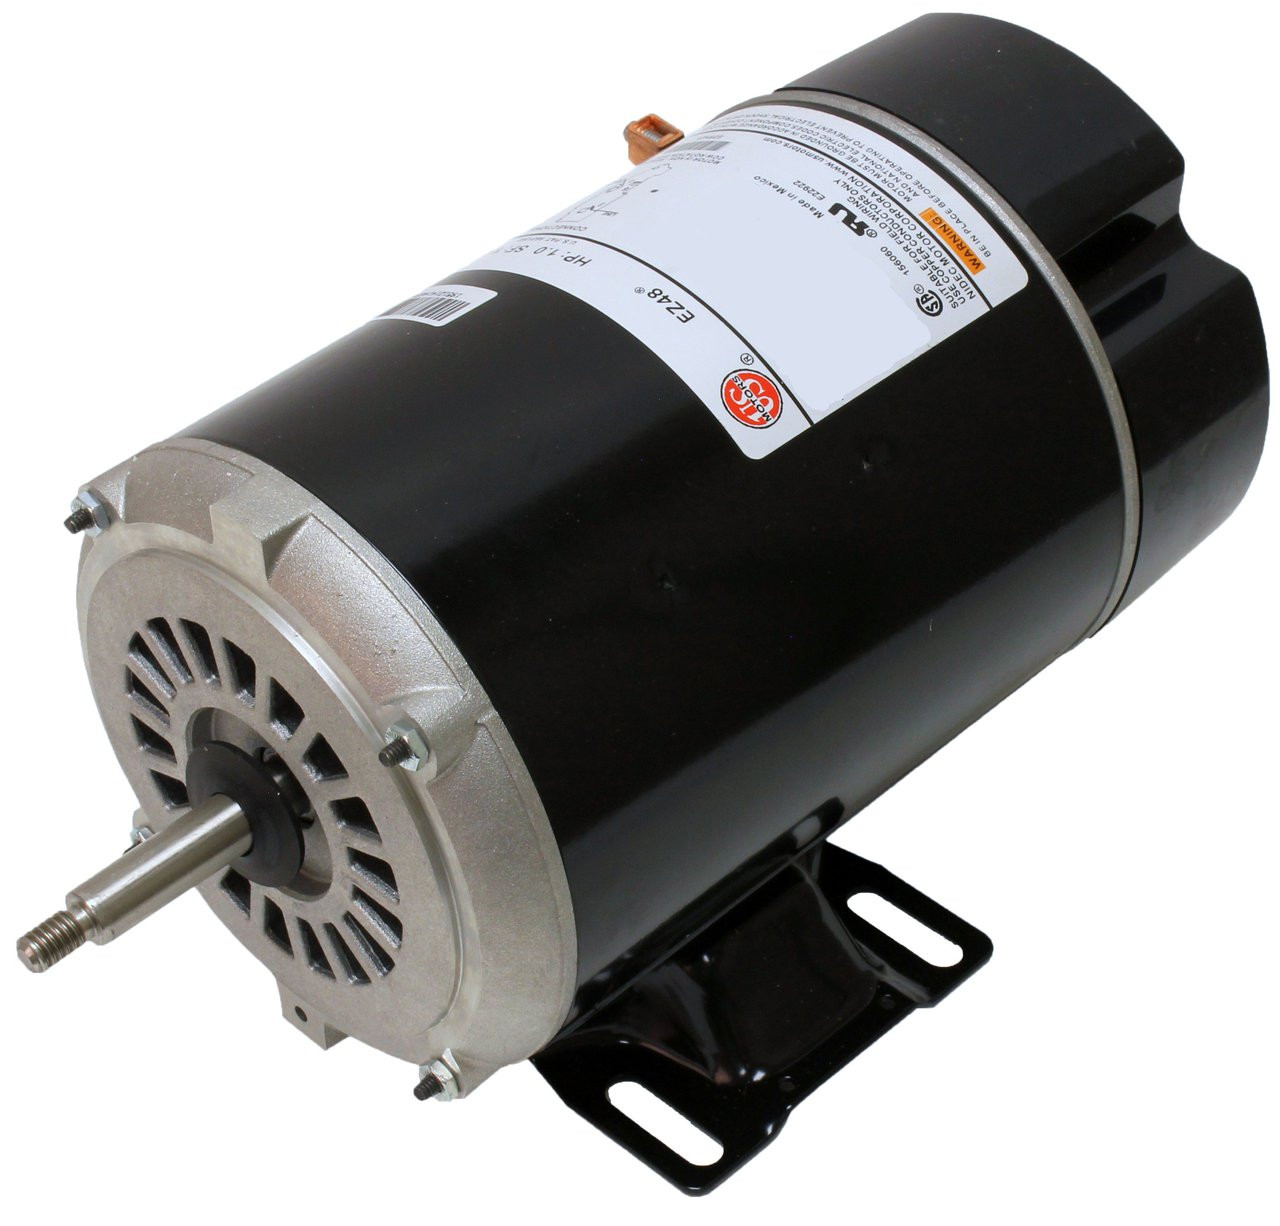 1.5 hp 3450/1725 RPM 48Y Frame 230V 2-Speed Pool & Spa Electric ...